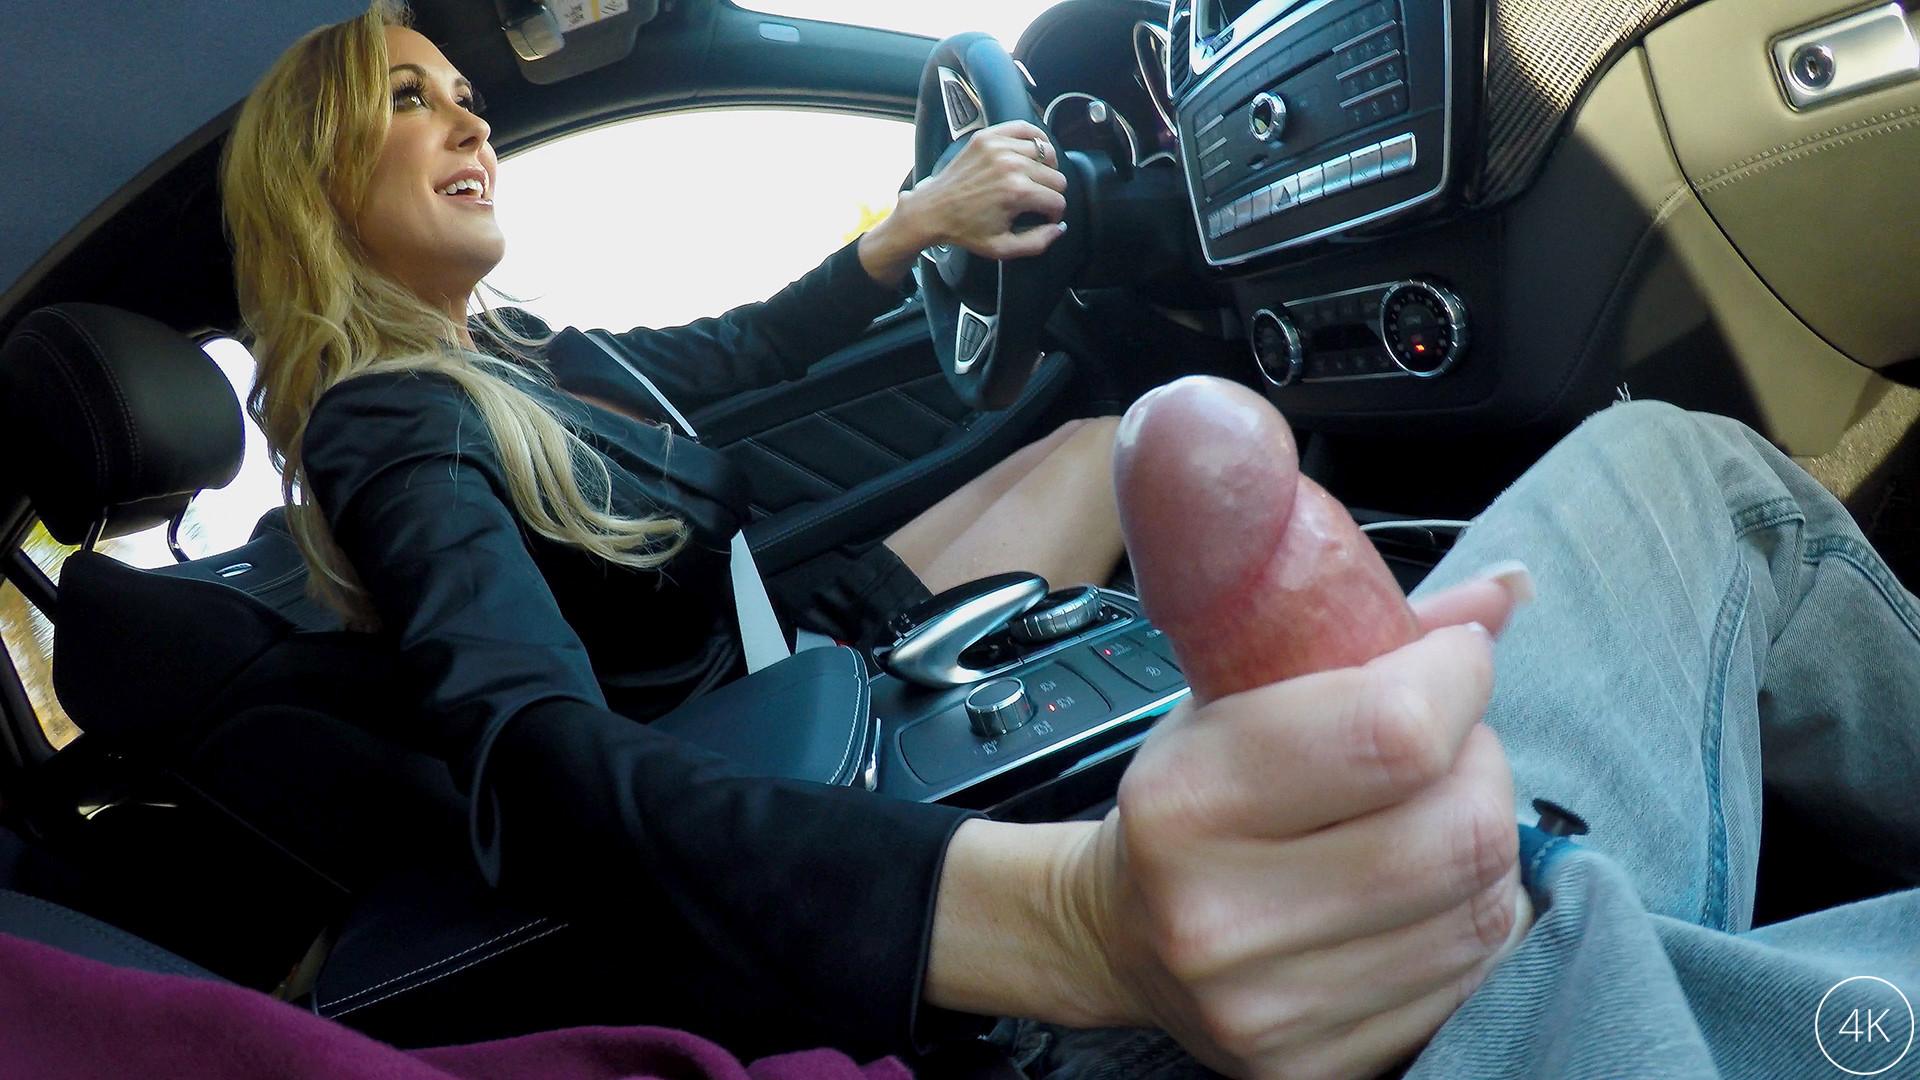 JulesJordan.com - Brandi Love: Test Drive